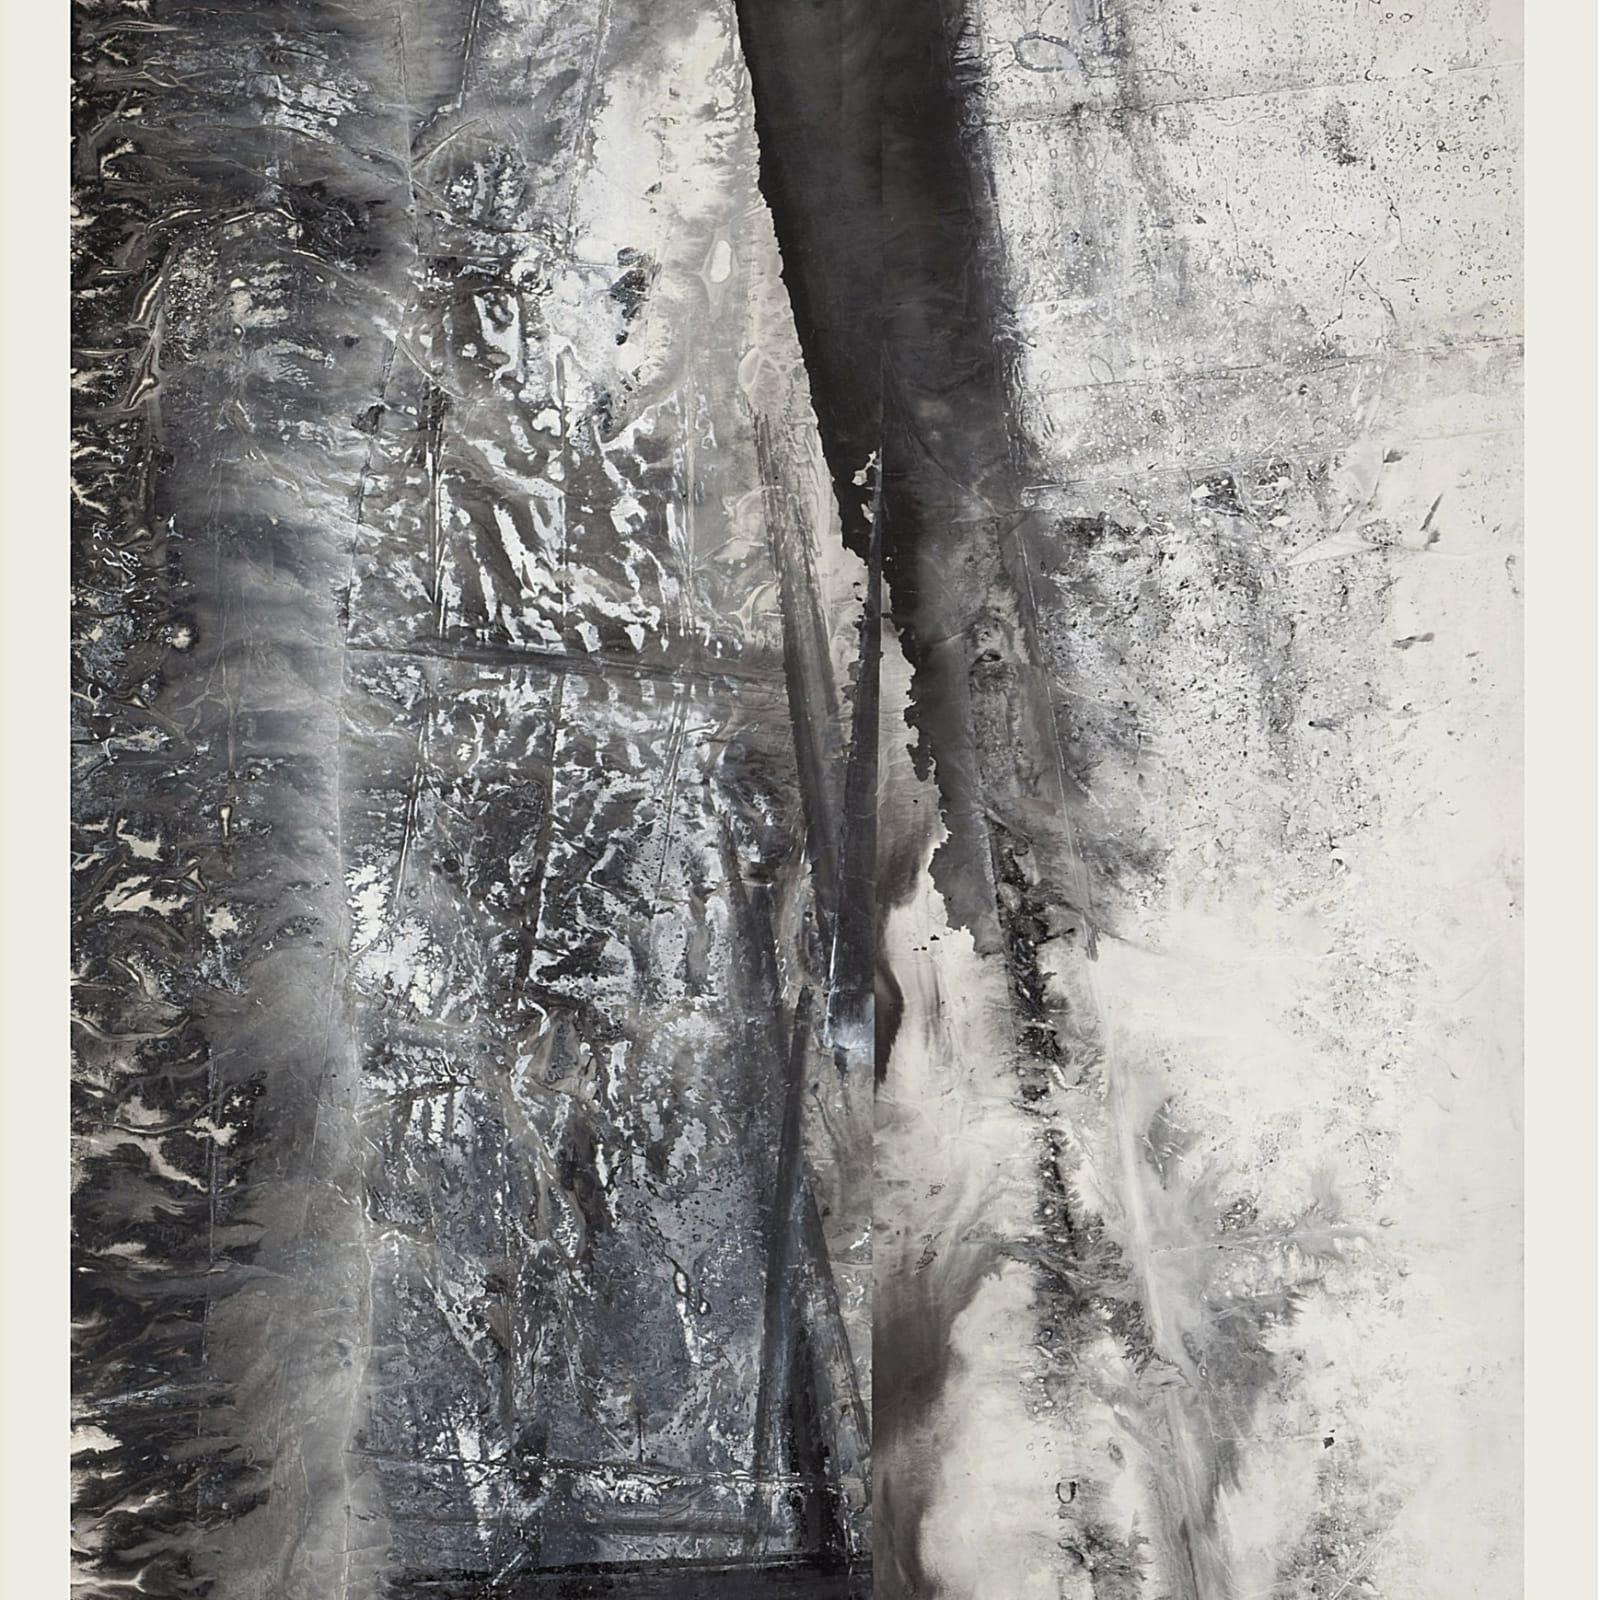 Zheng Chongbin 郑重宾, Oblique Direction 倾斜的方向, 2015